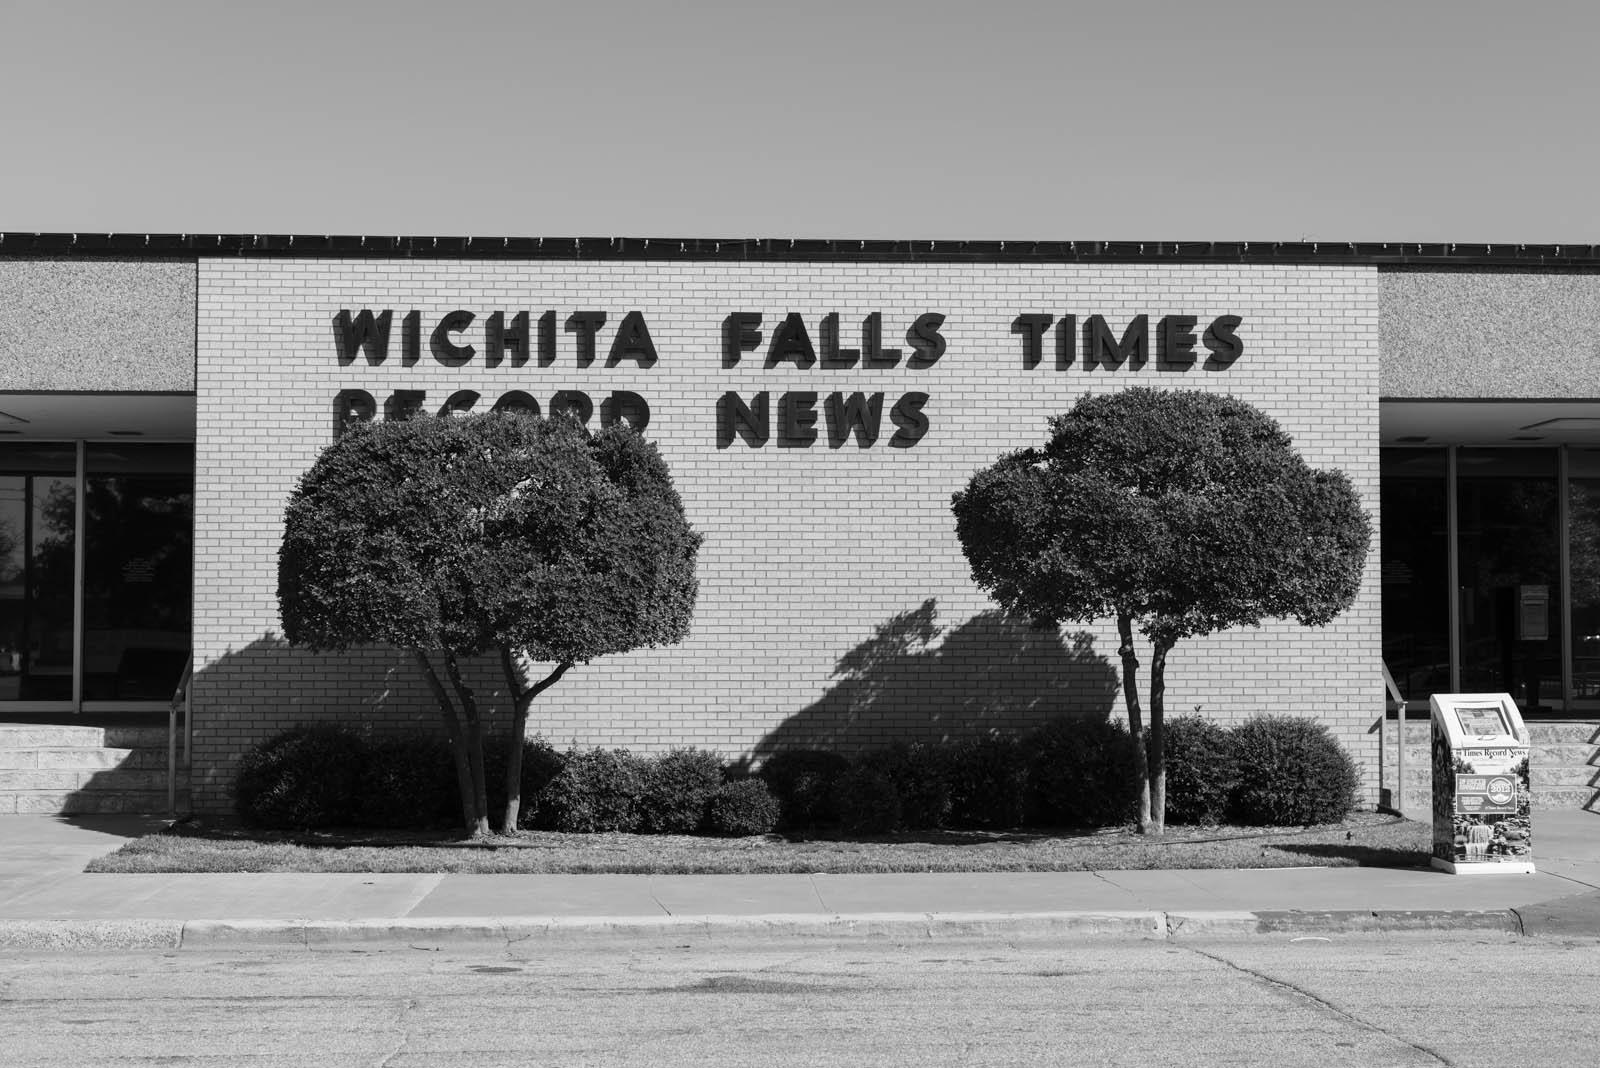 Texas wichita falls law on dating